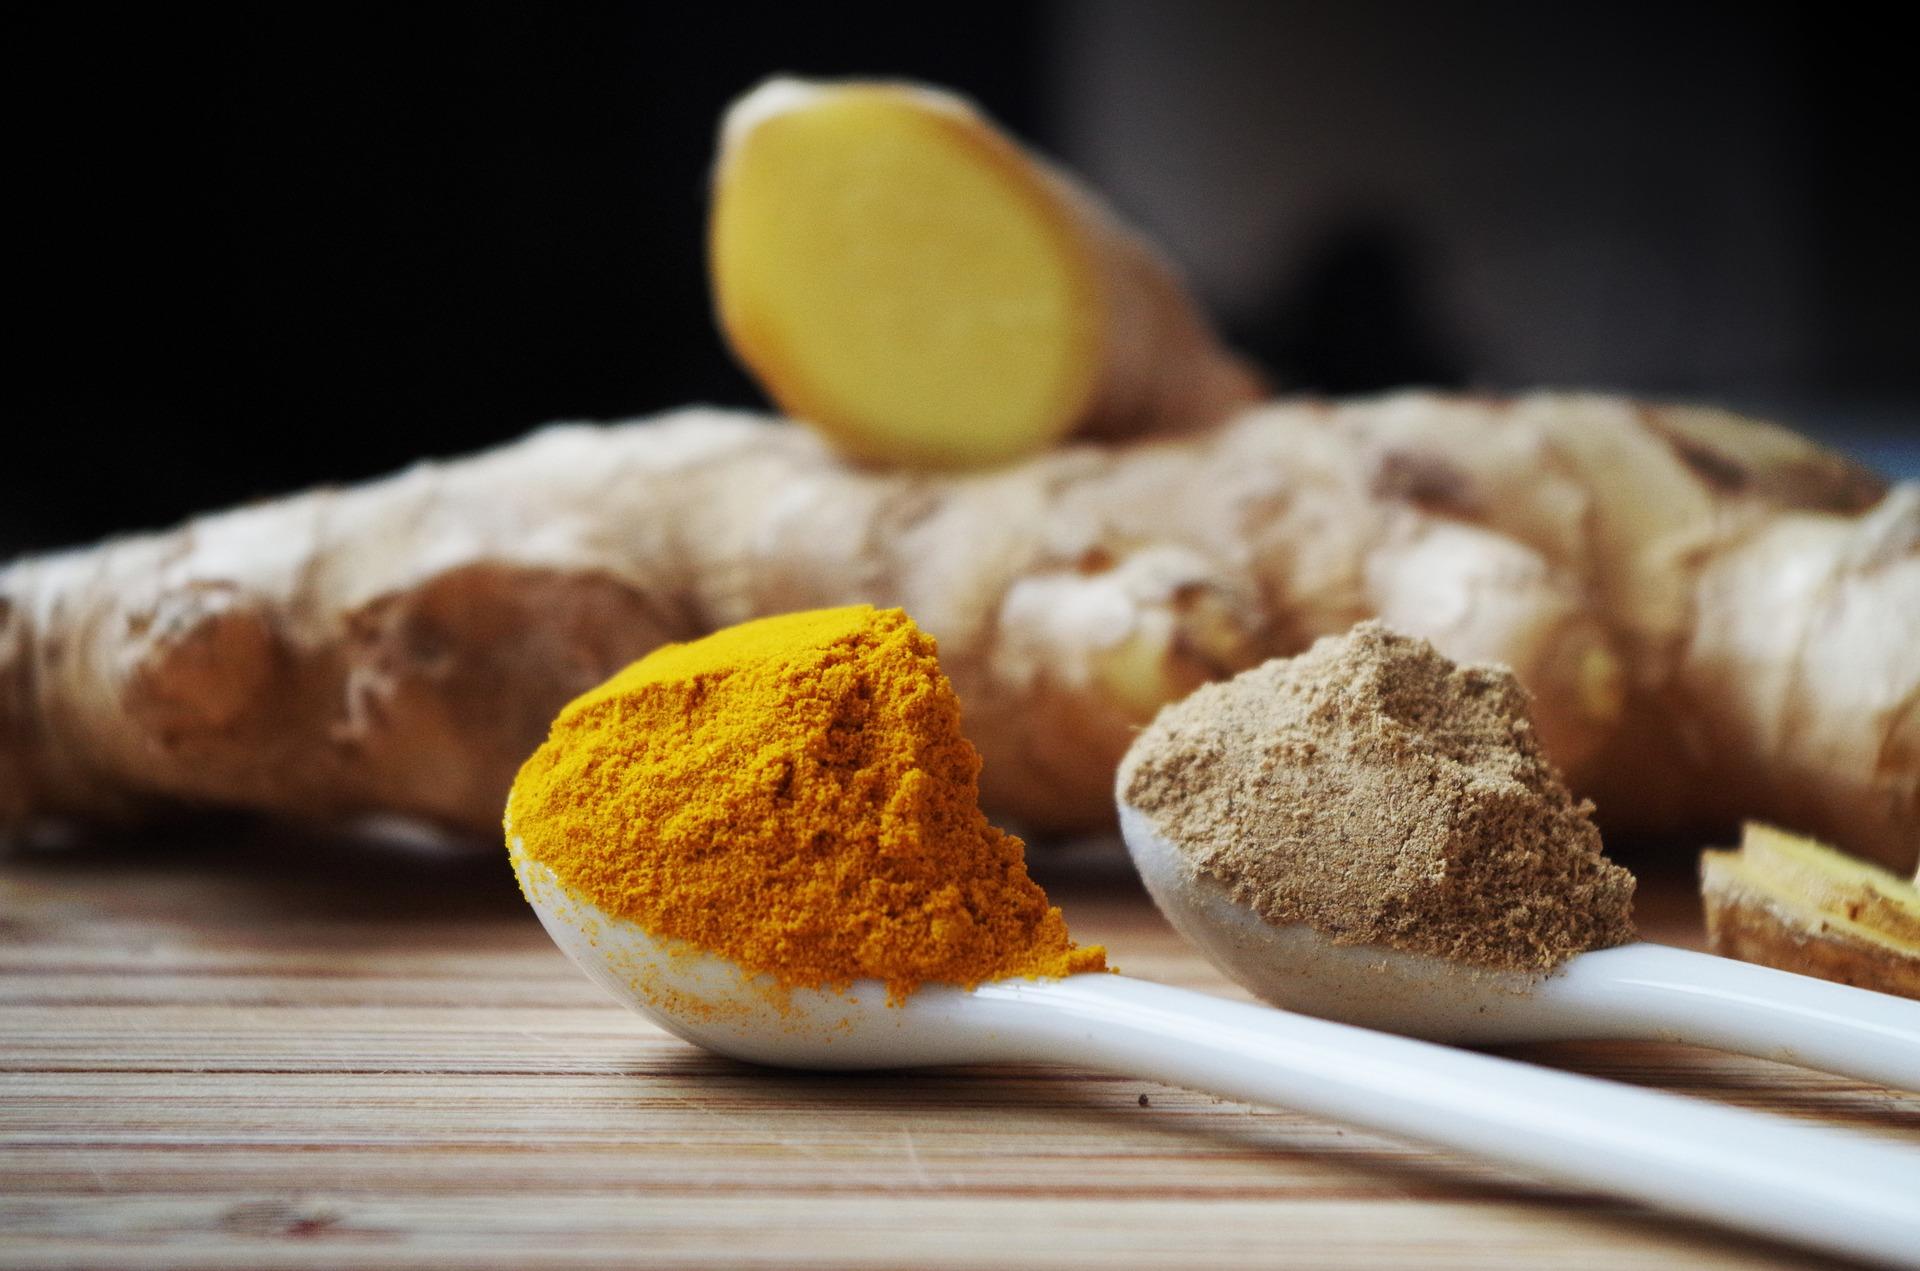 Ginger turmeric food mood